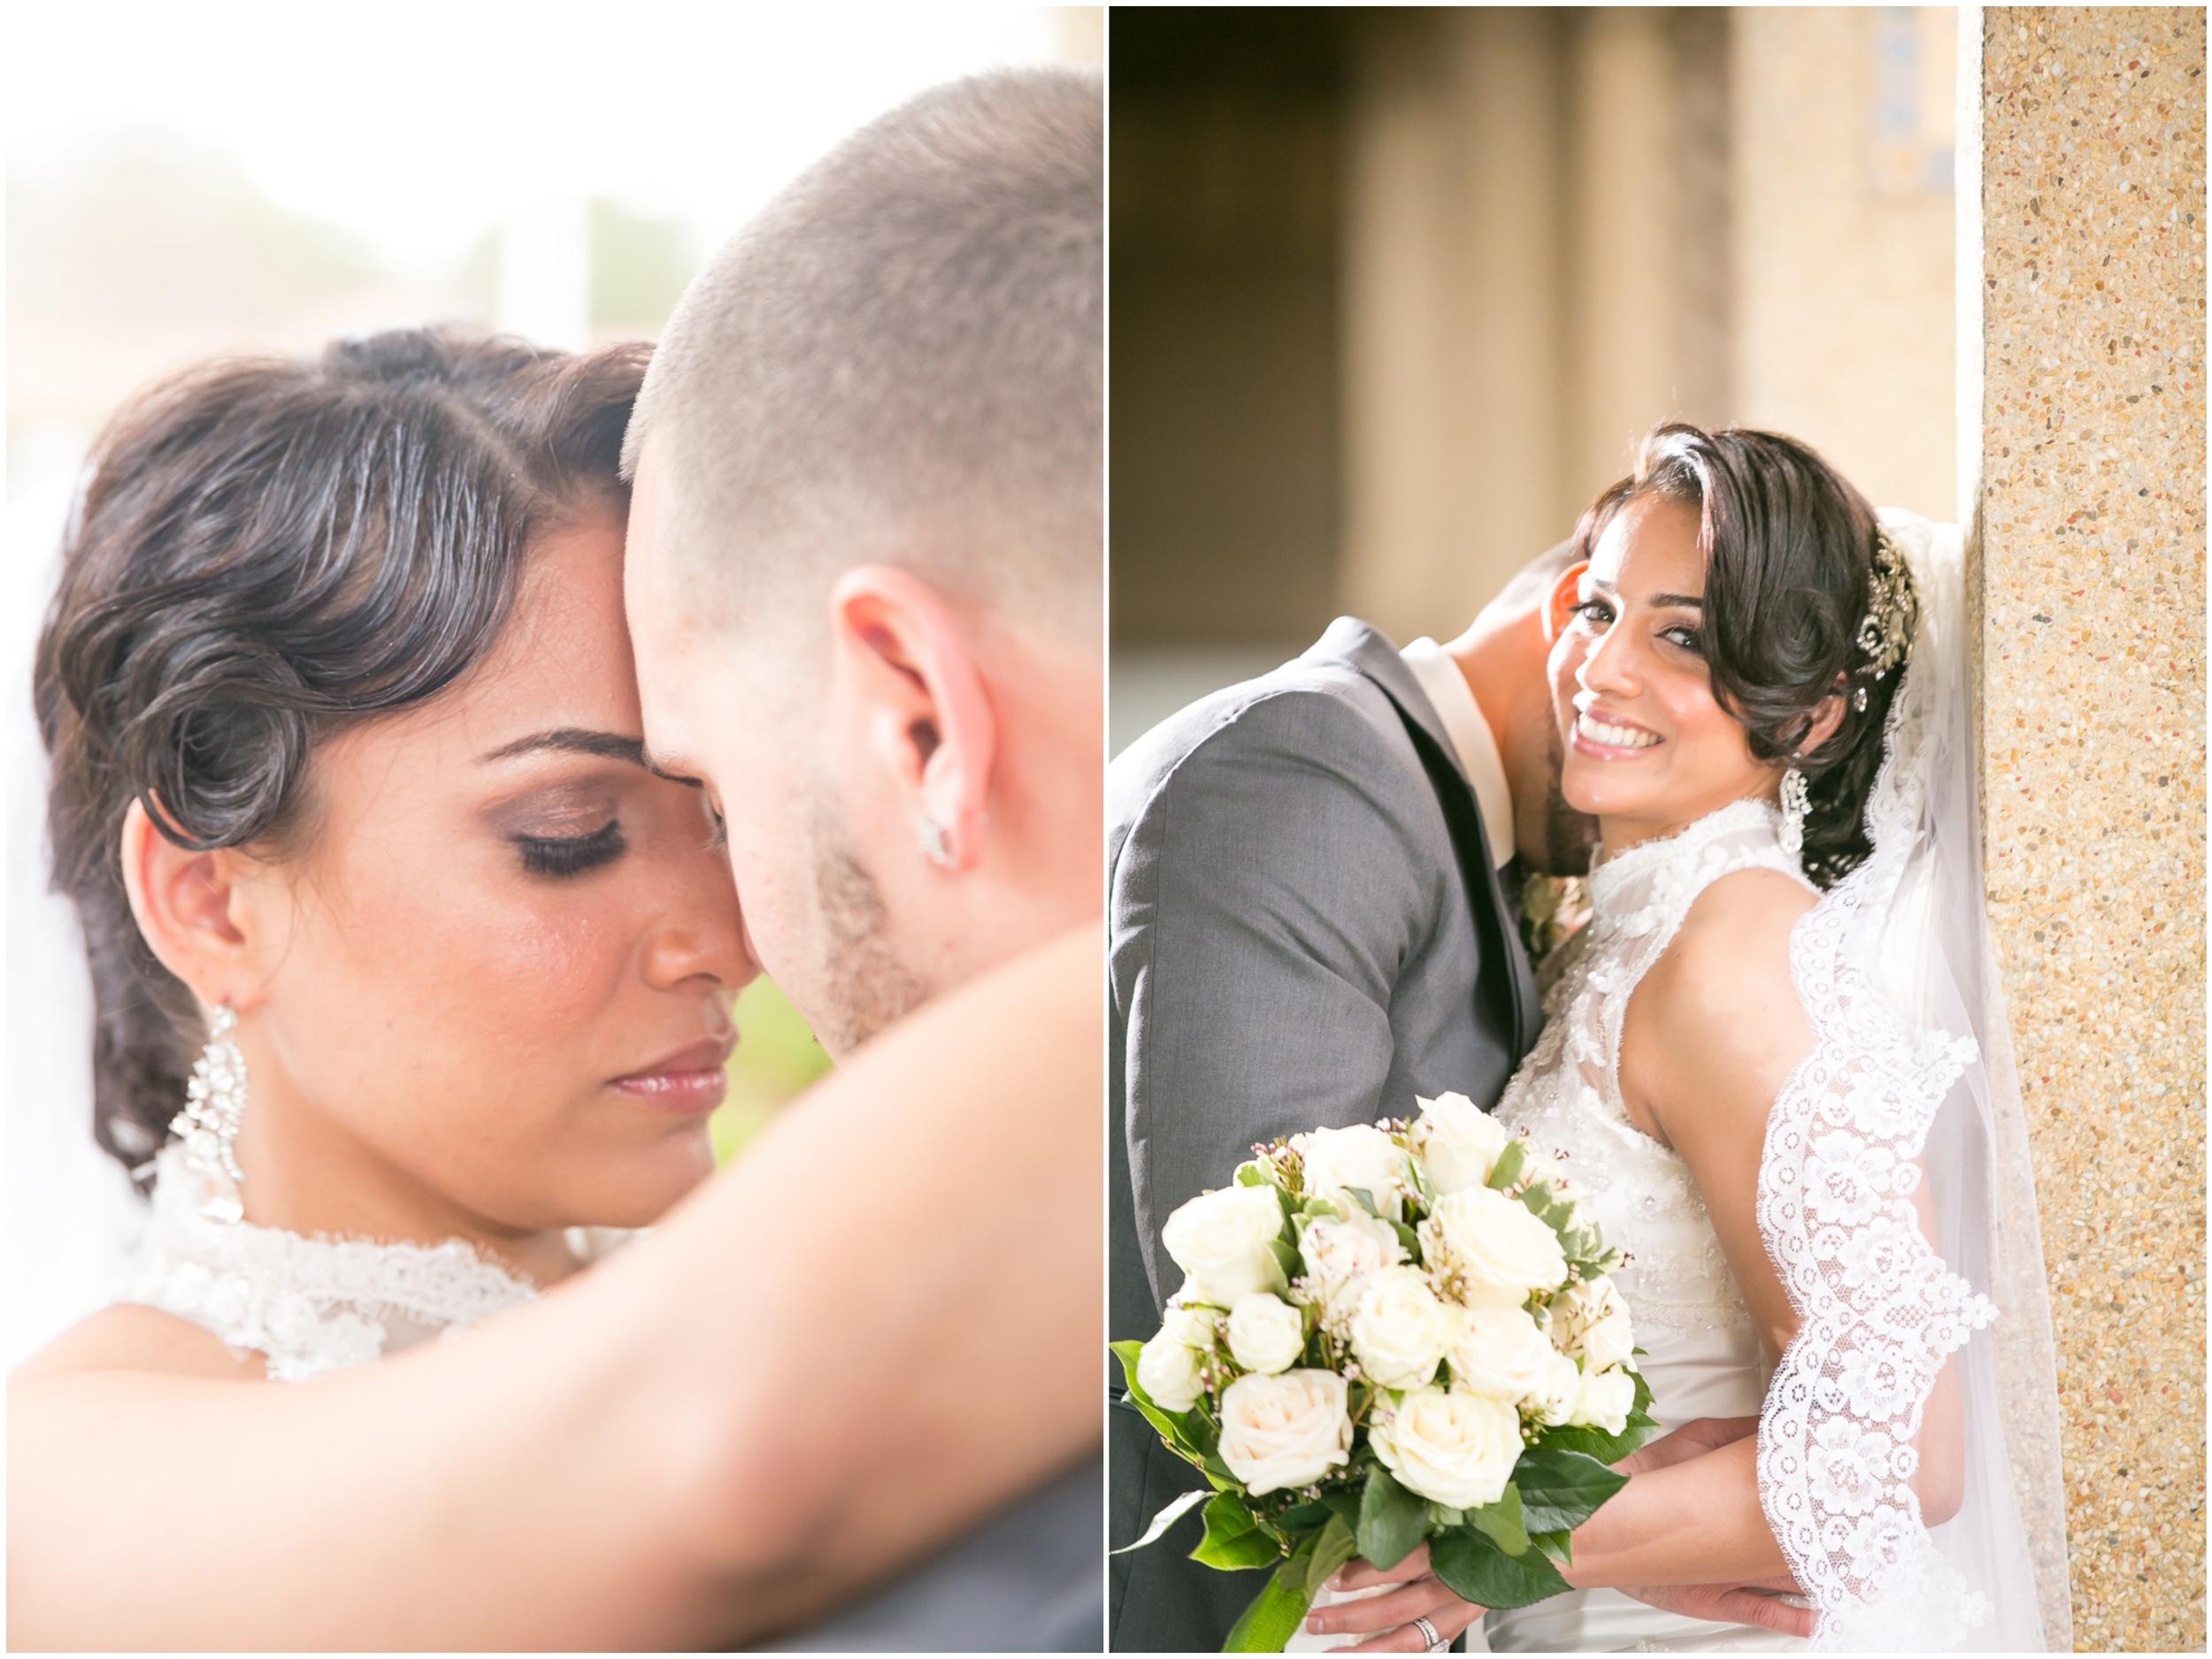 Bradly-and-Jesenia-Wedding-Collage-28.jpg